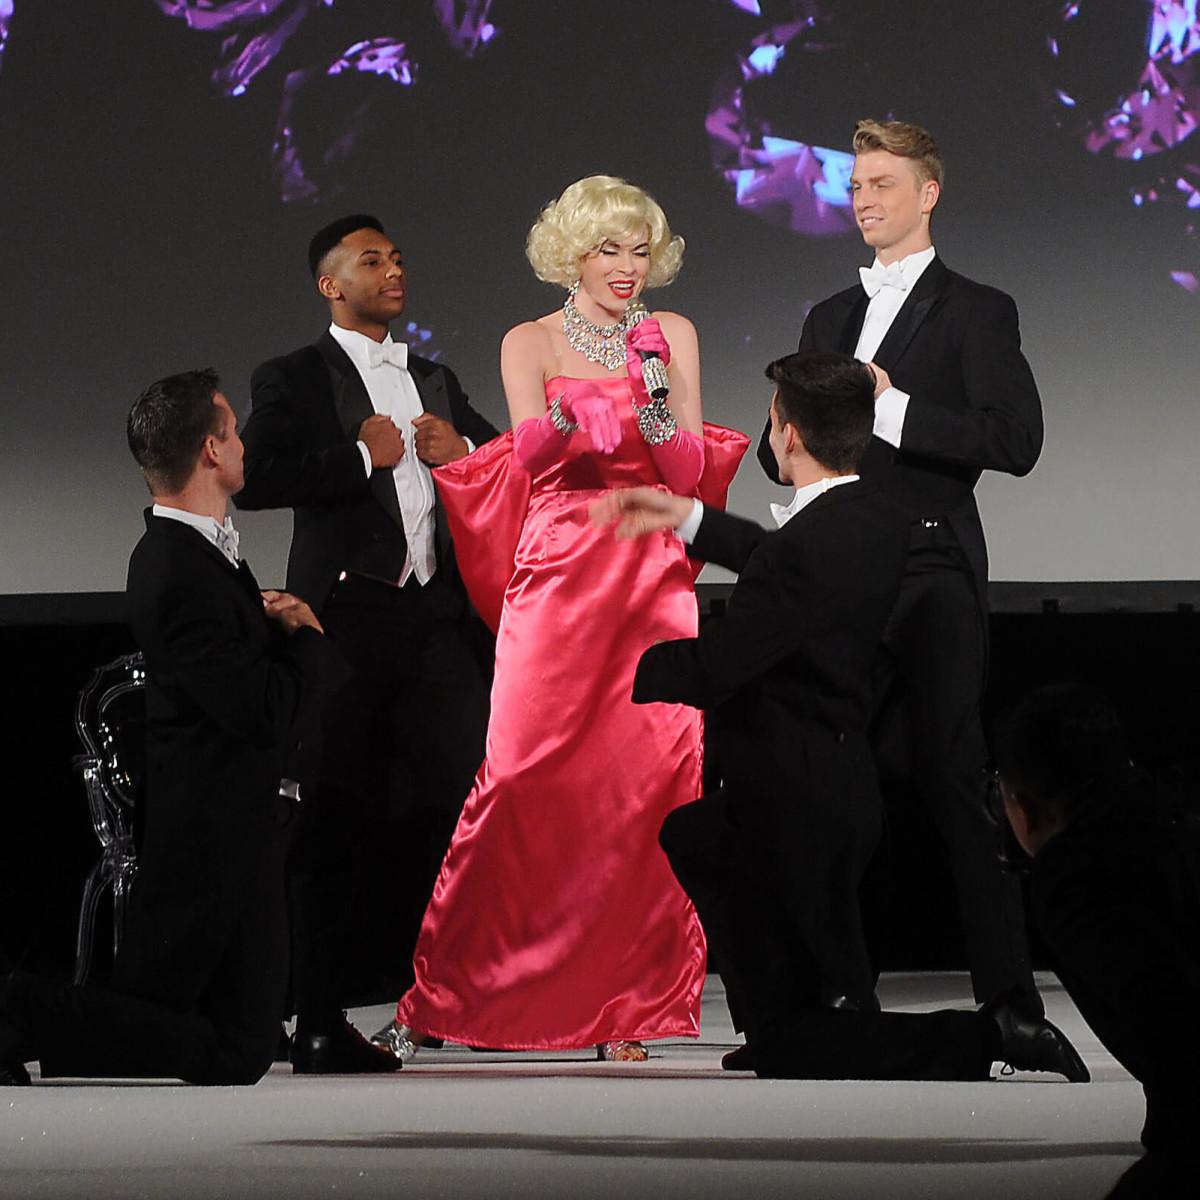 Houston, Winter Ball Women of Distinction, Feb 2017, Performance by Marilyn Monroe  impersonator